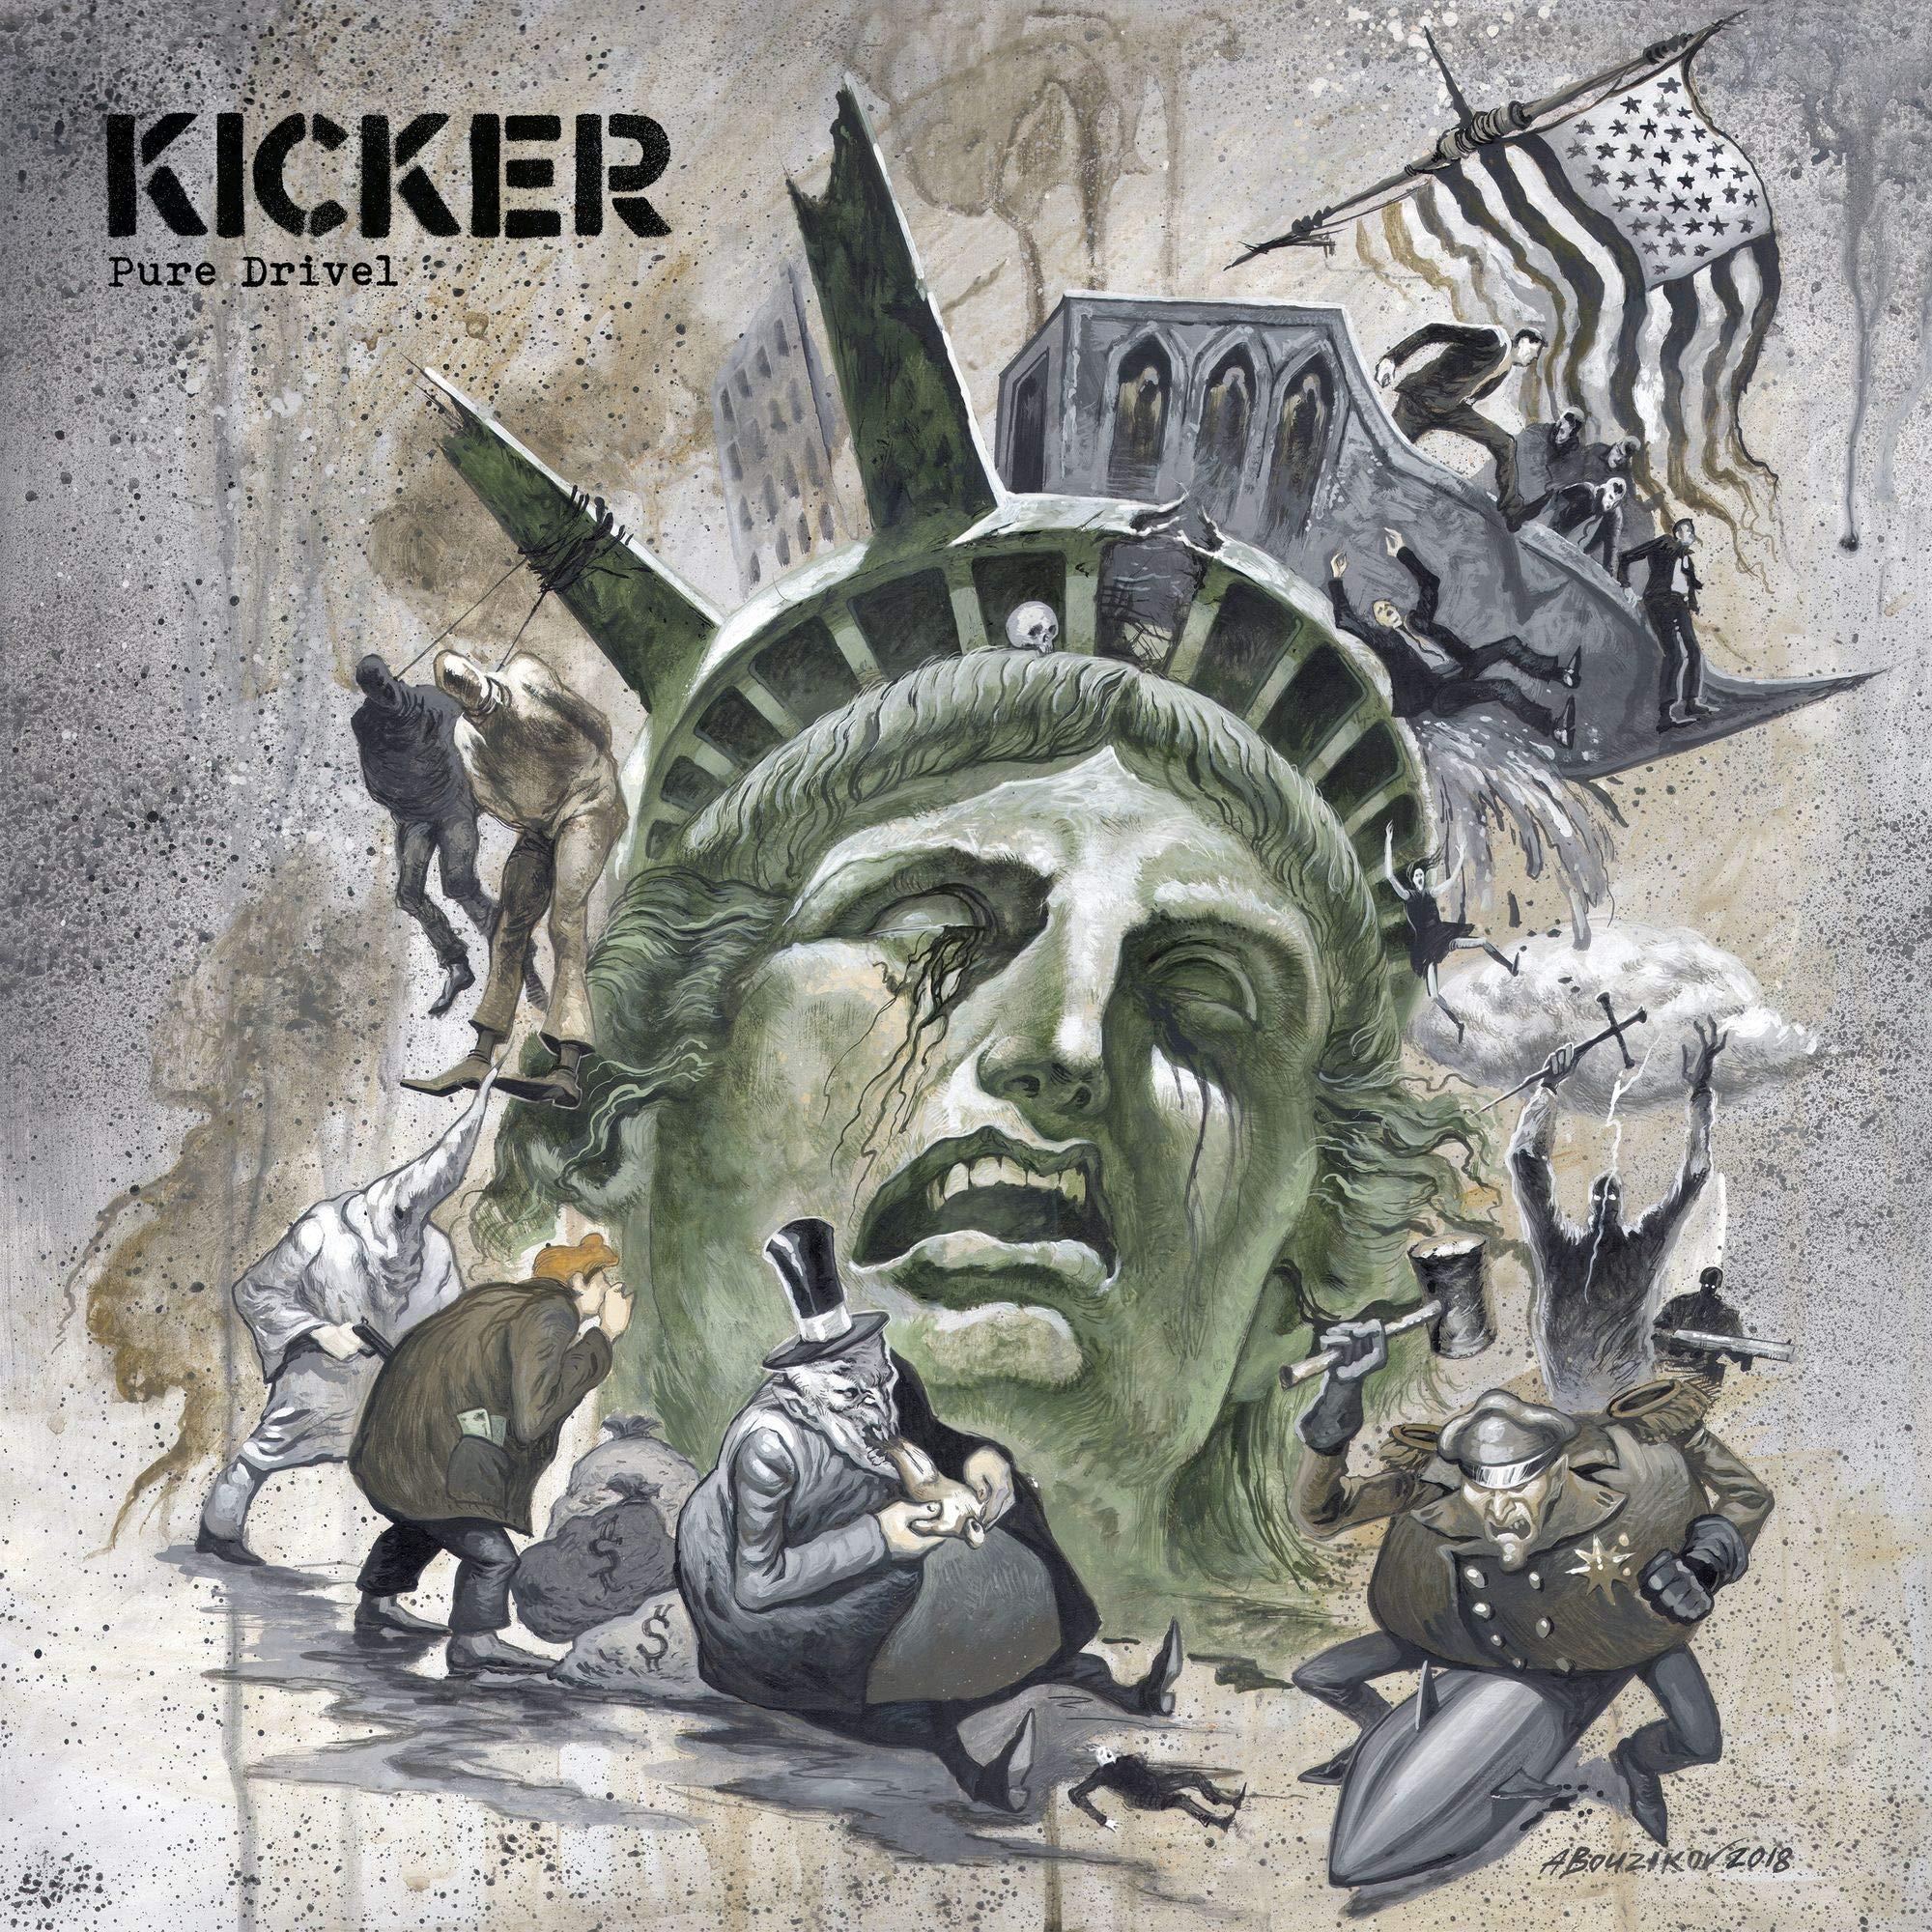 Vinilo : Kicker - Pure Drivel (LP Vinyl)